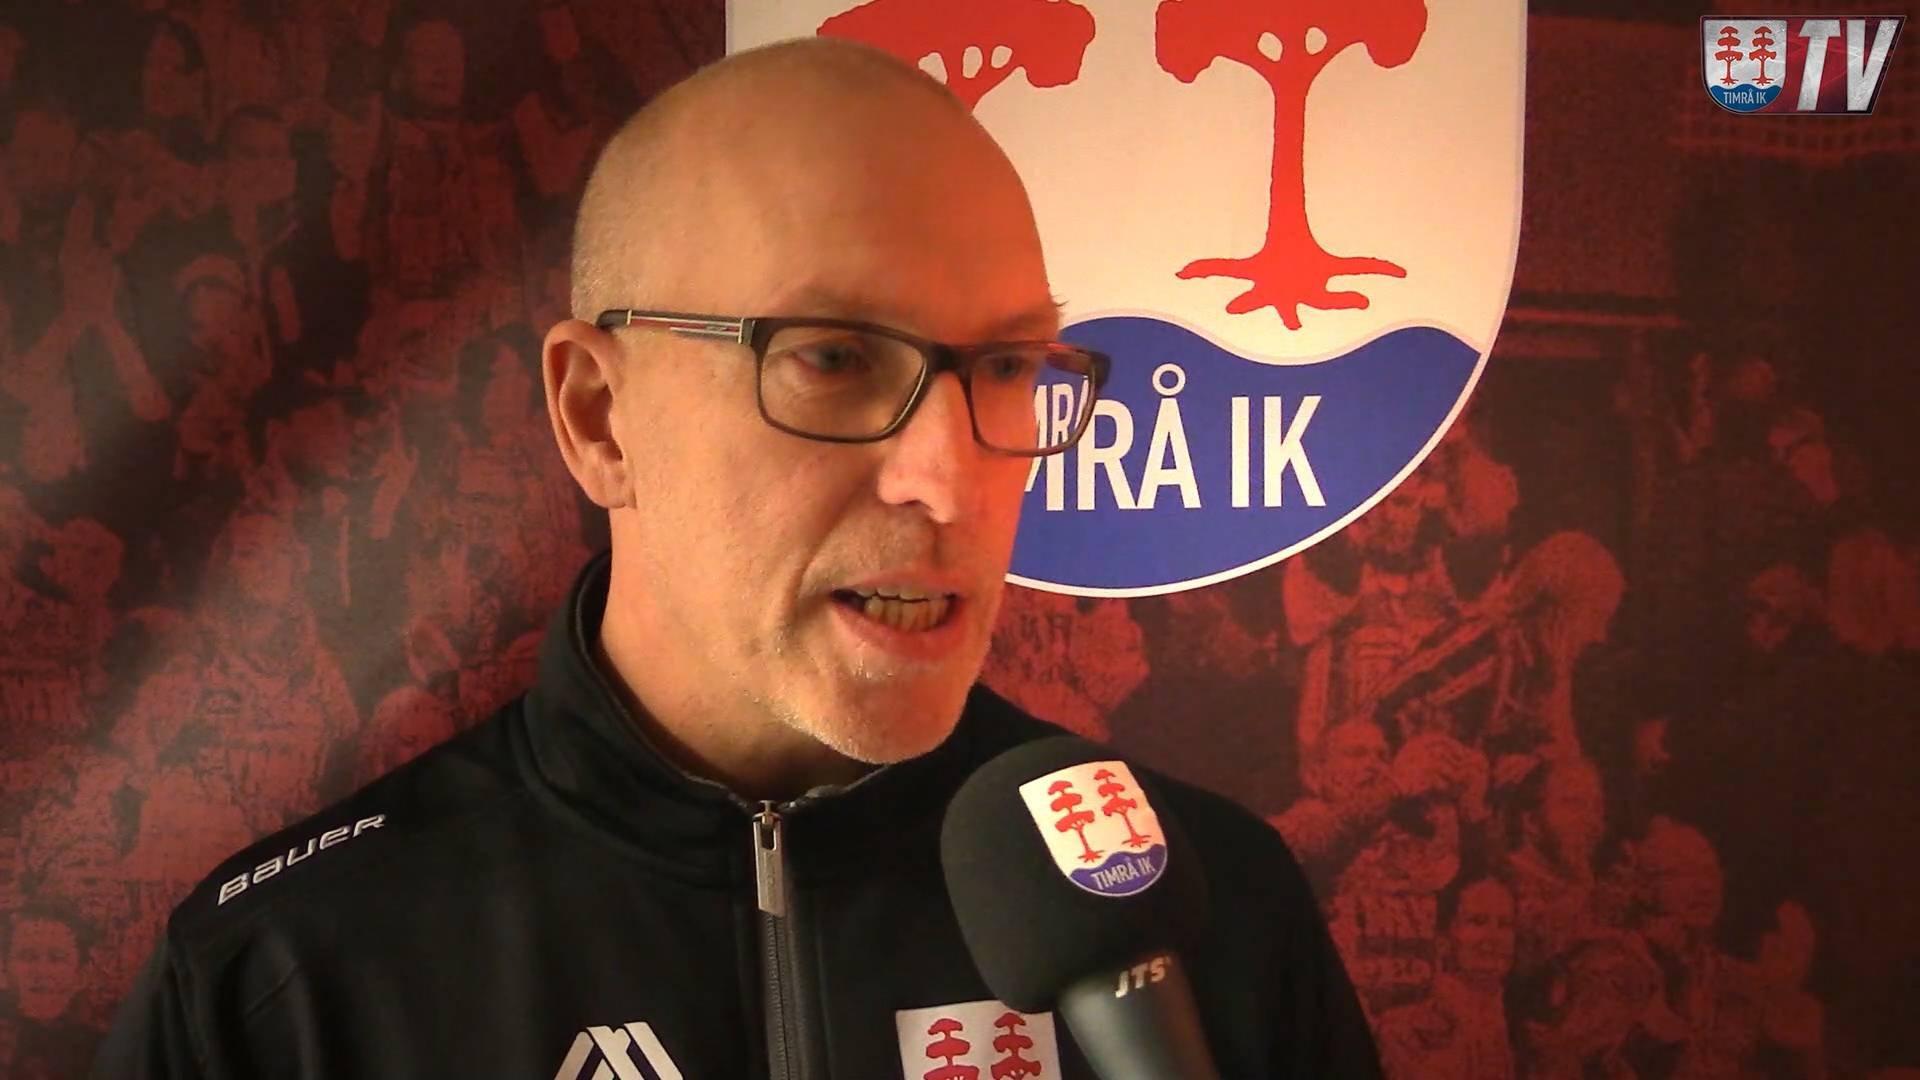 Fredrik inför Karlskrona